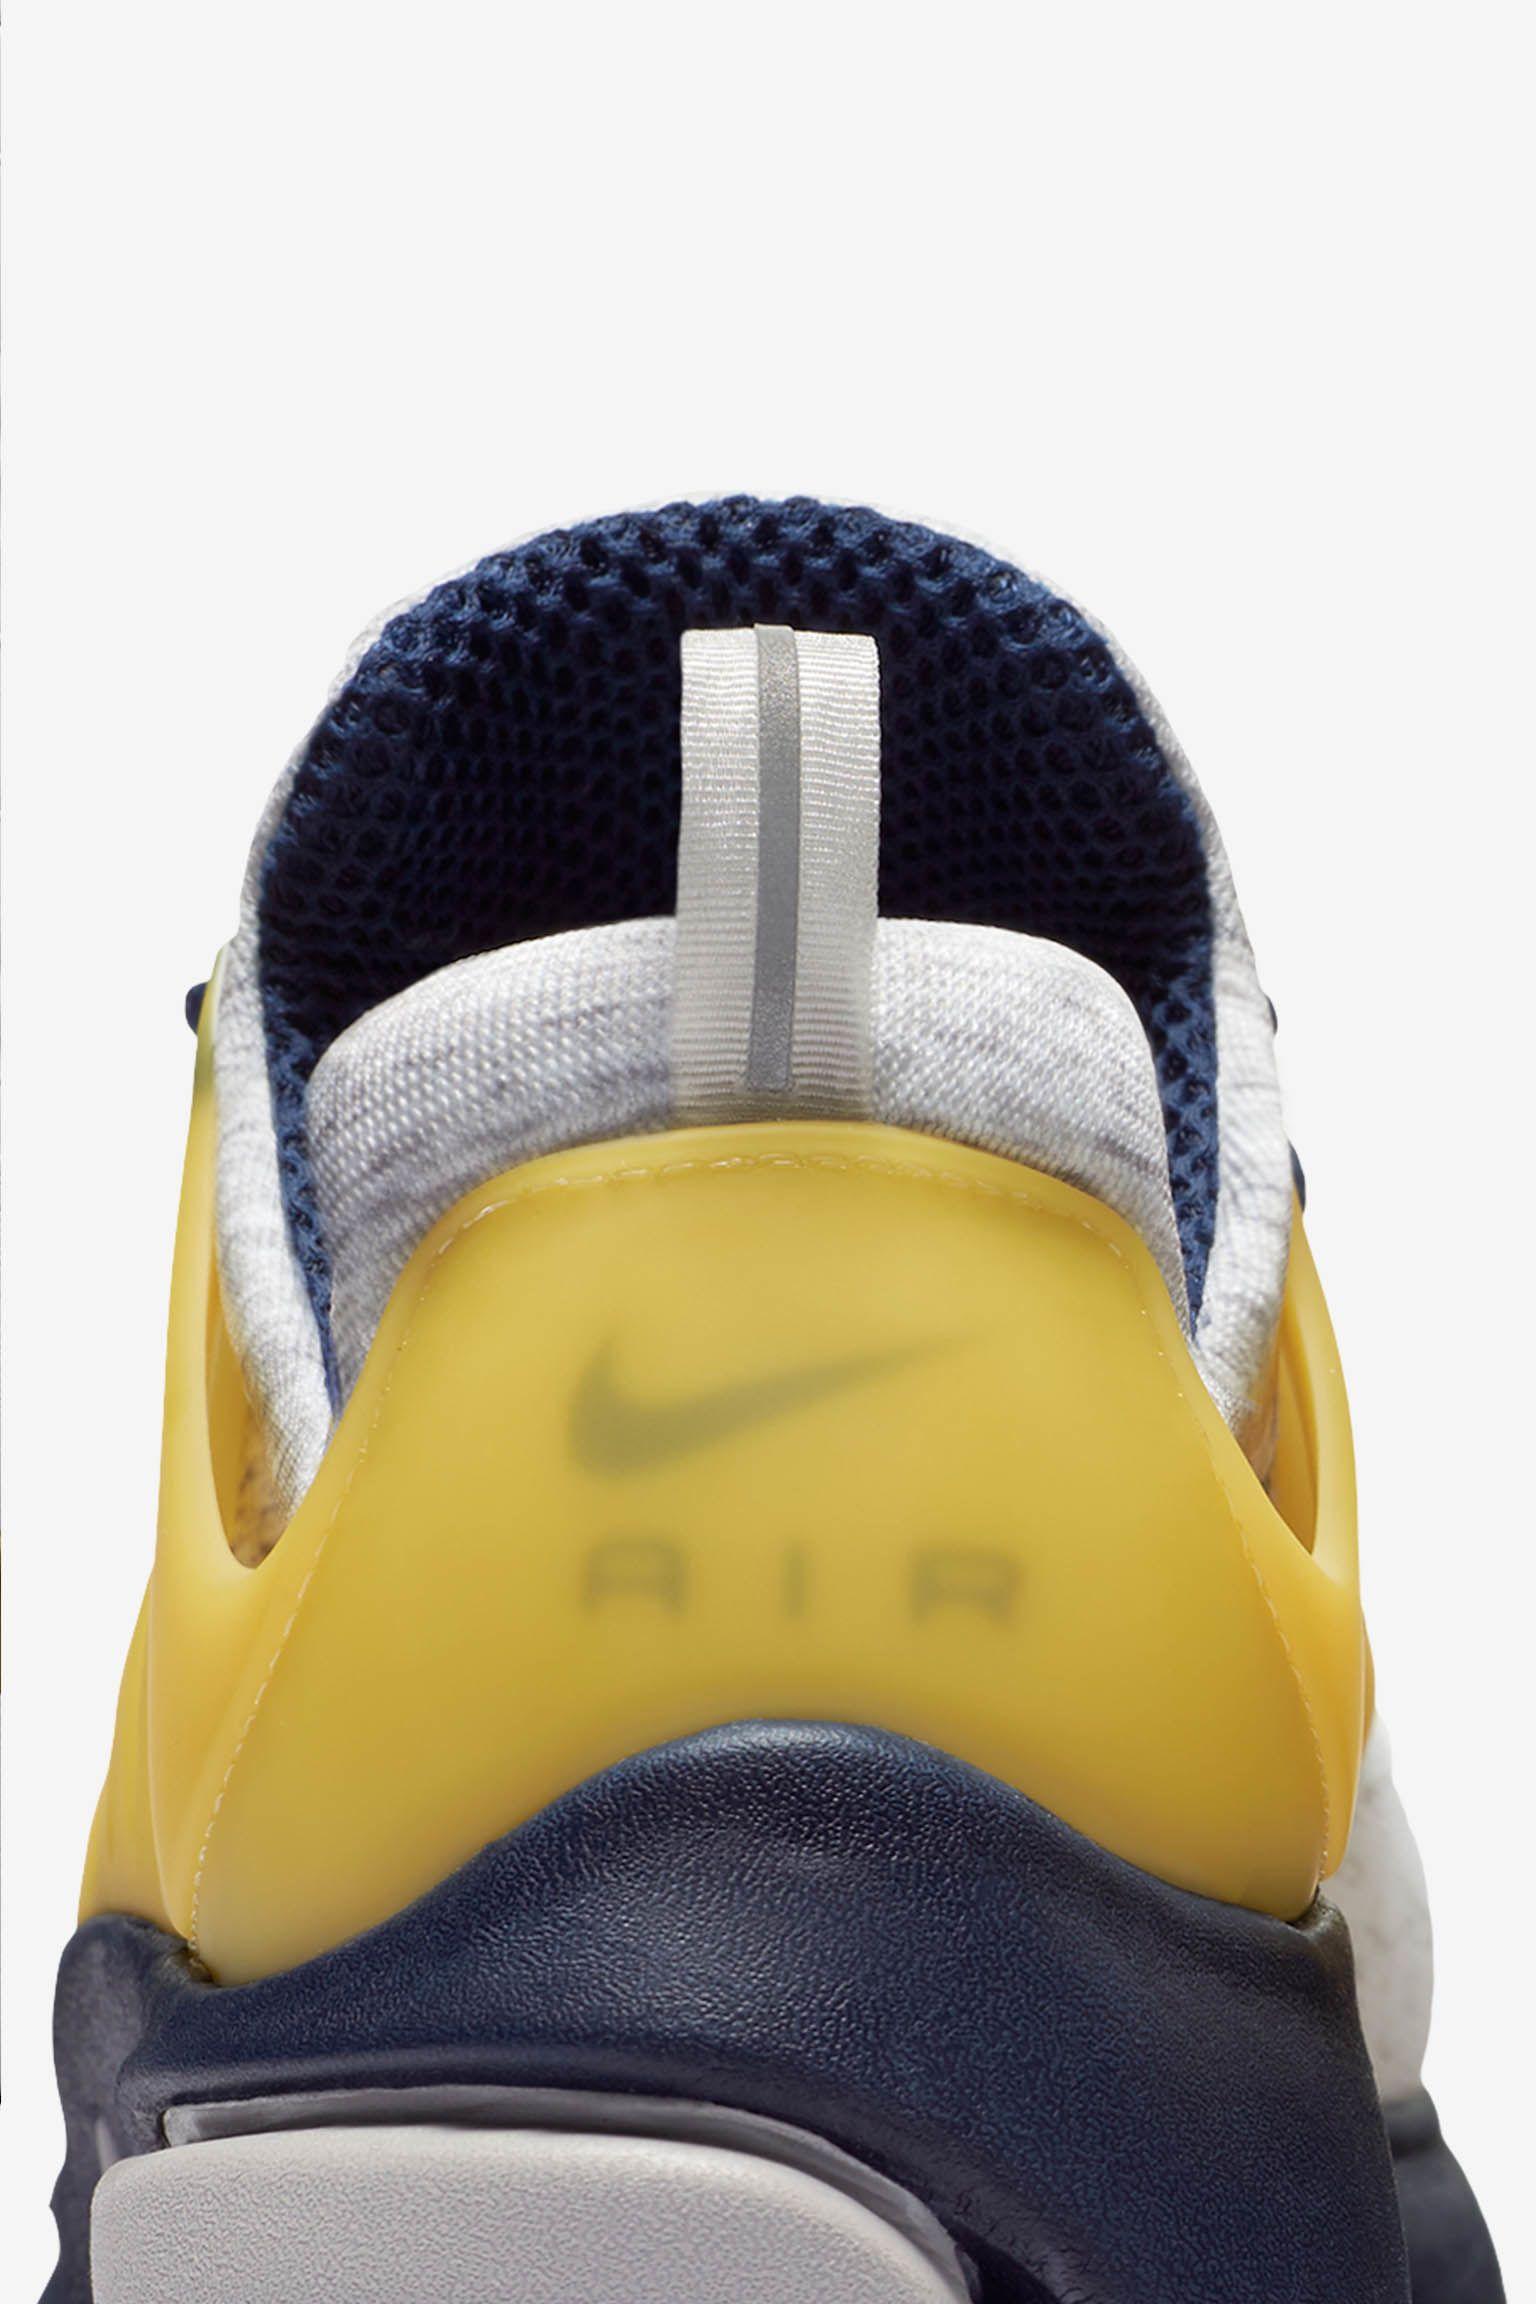 Nike Air Presto 'Shady Milkman' Release Date